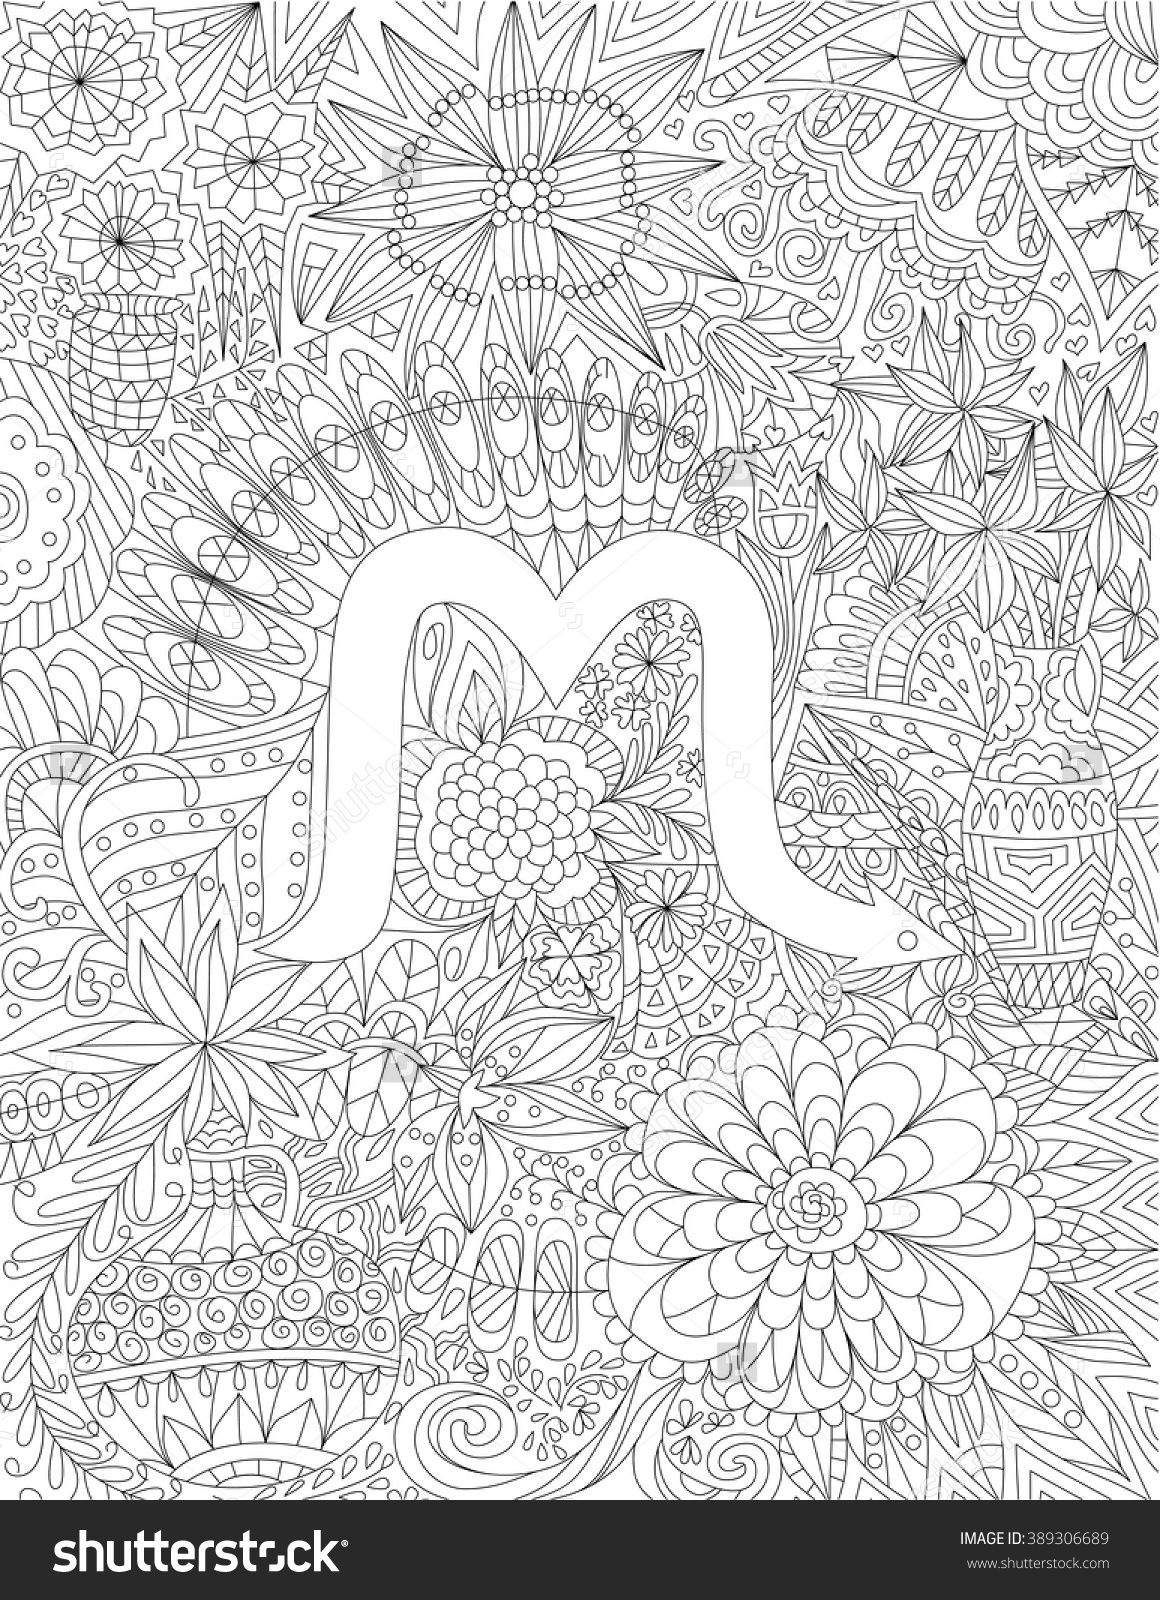 Zodiac sign scorpio ethnic floral geometric doodle pattern coloring